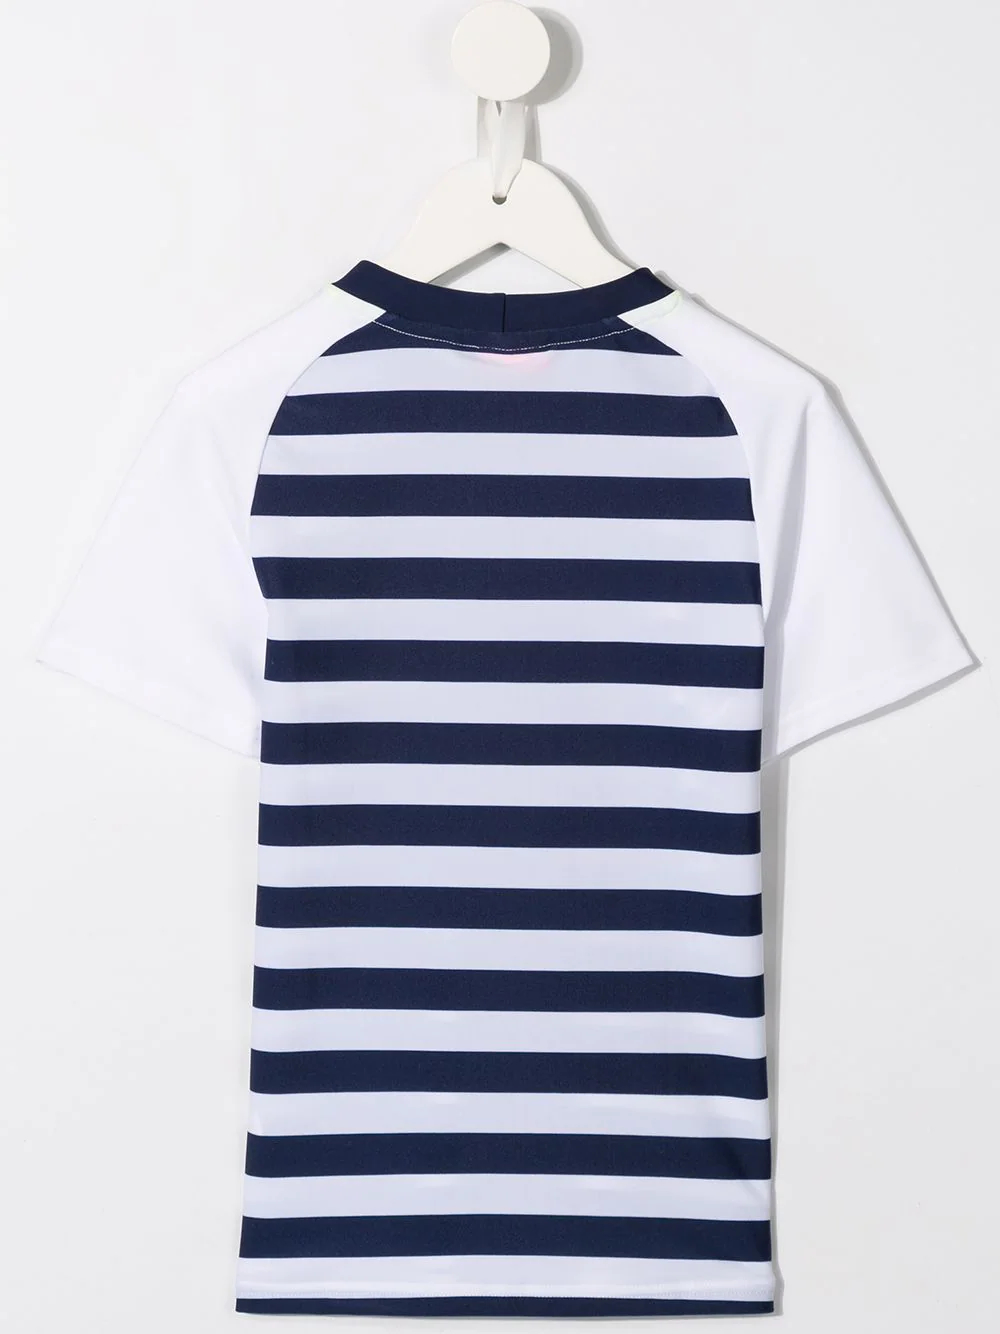 SUNUVA | Sunuva полосатая футболка с рукавами-реглан | Clouty